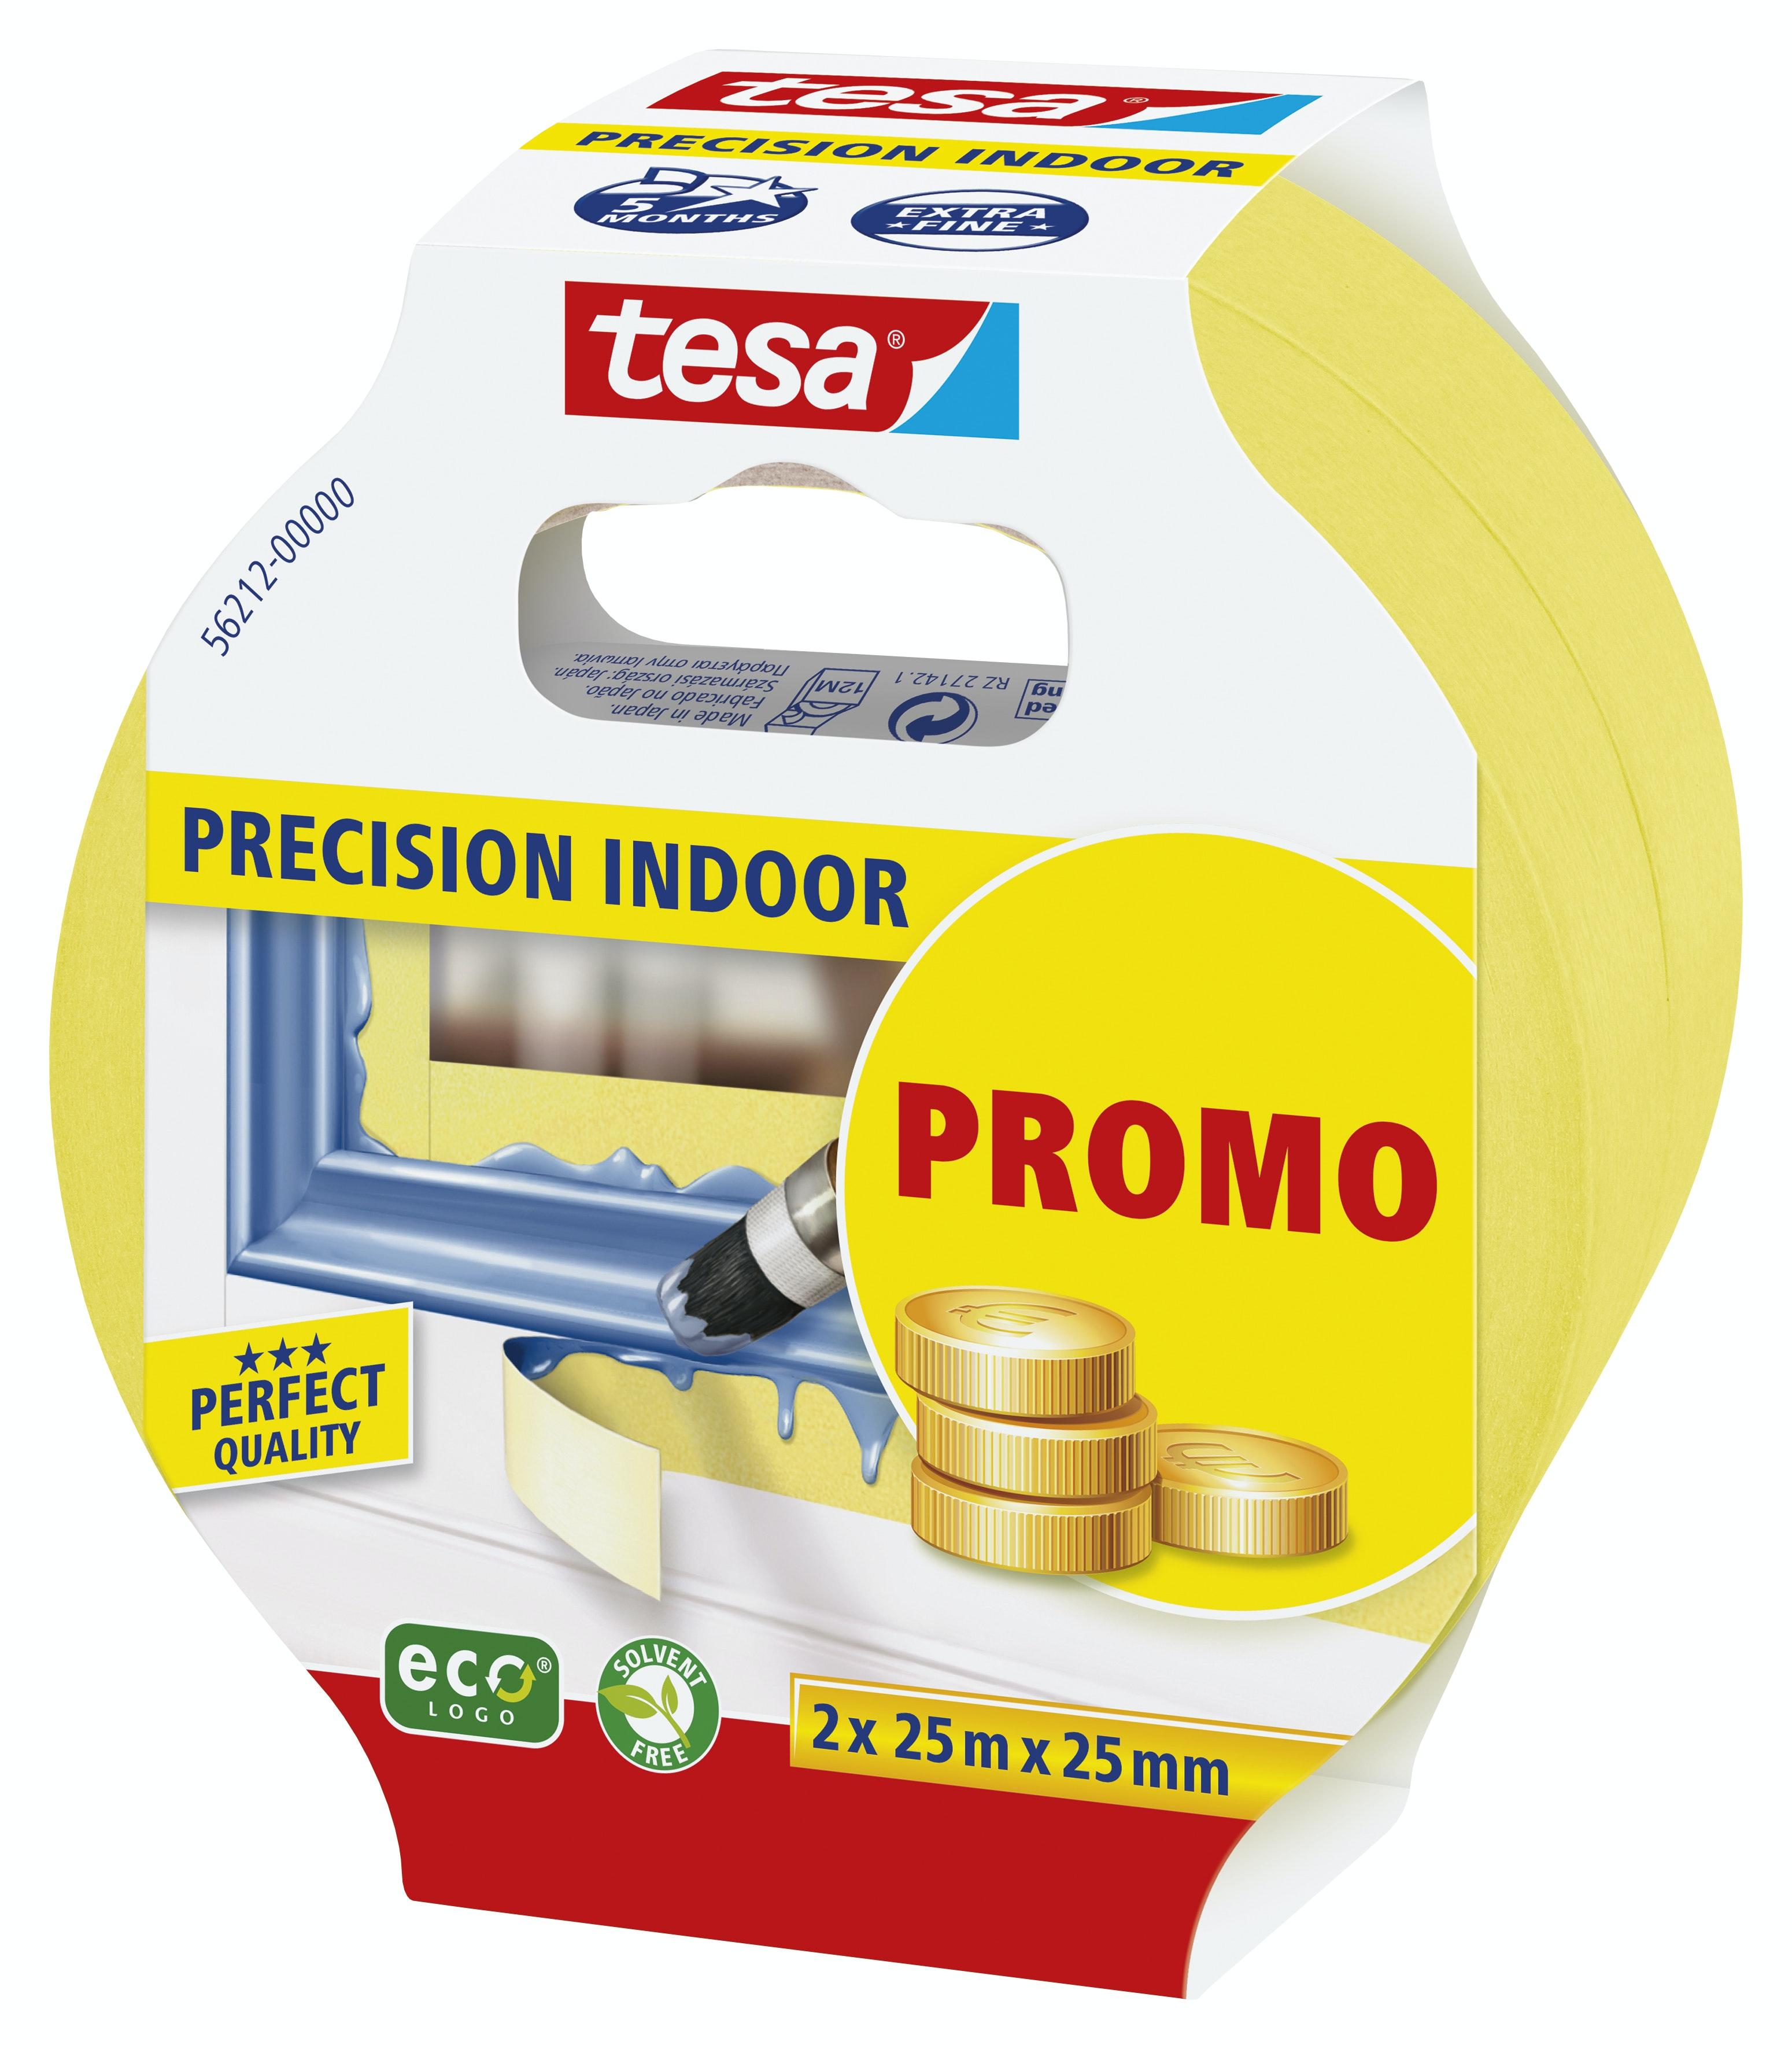 Maskeringstejp Tesa Precision Indoor Promo 2-Pack Gul 2x25mmx25m